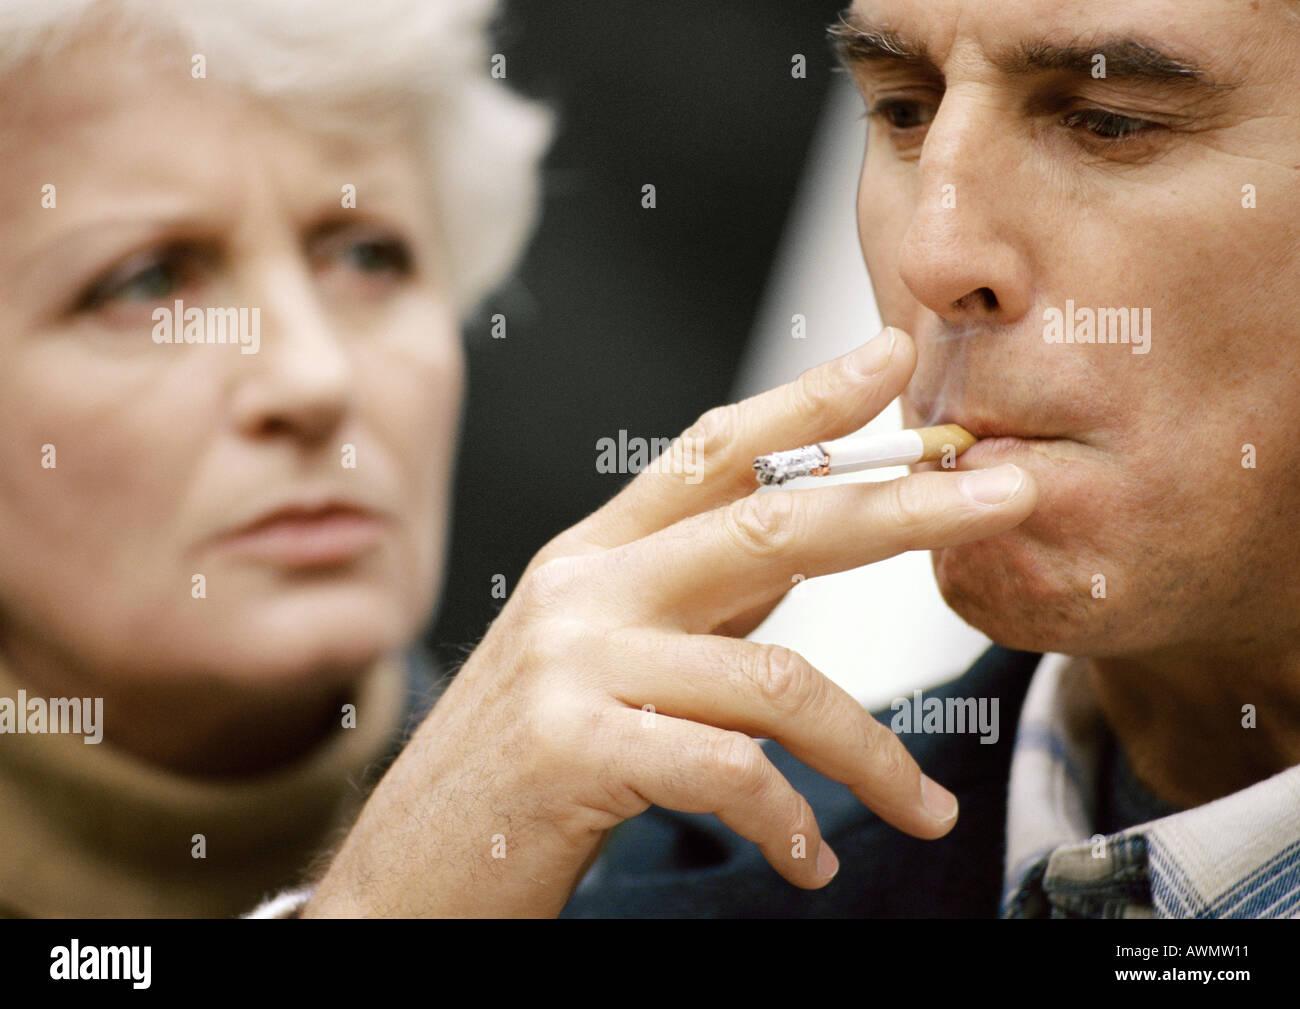 Le tabagisme, l'homme femme floue dans background, close-up Banque D'Images